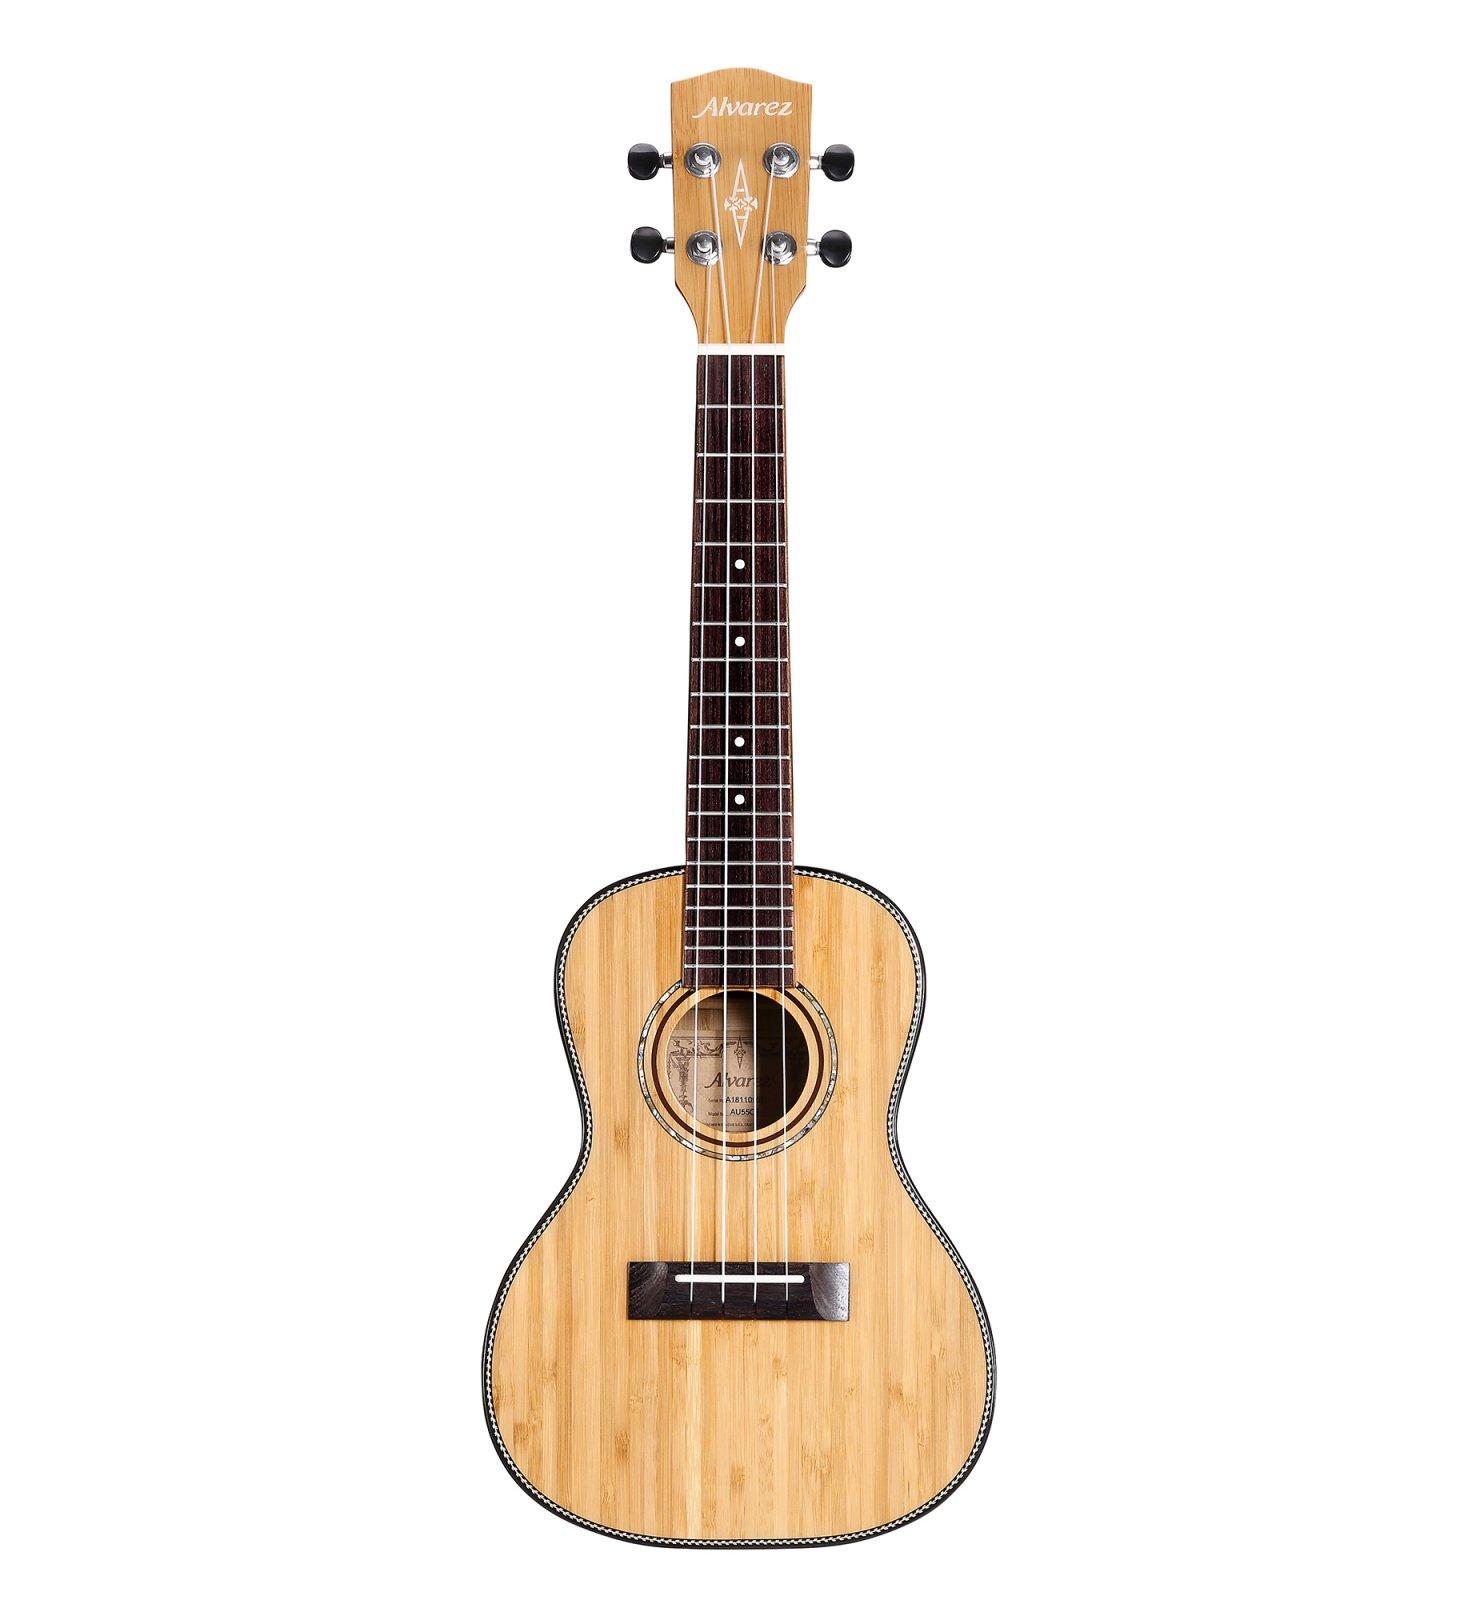 Alvarez MU55CE Masterworks All-Solid Acoustic/Electric Concert Ukulele